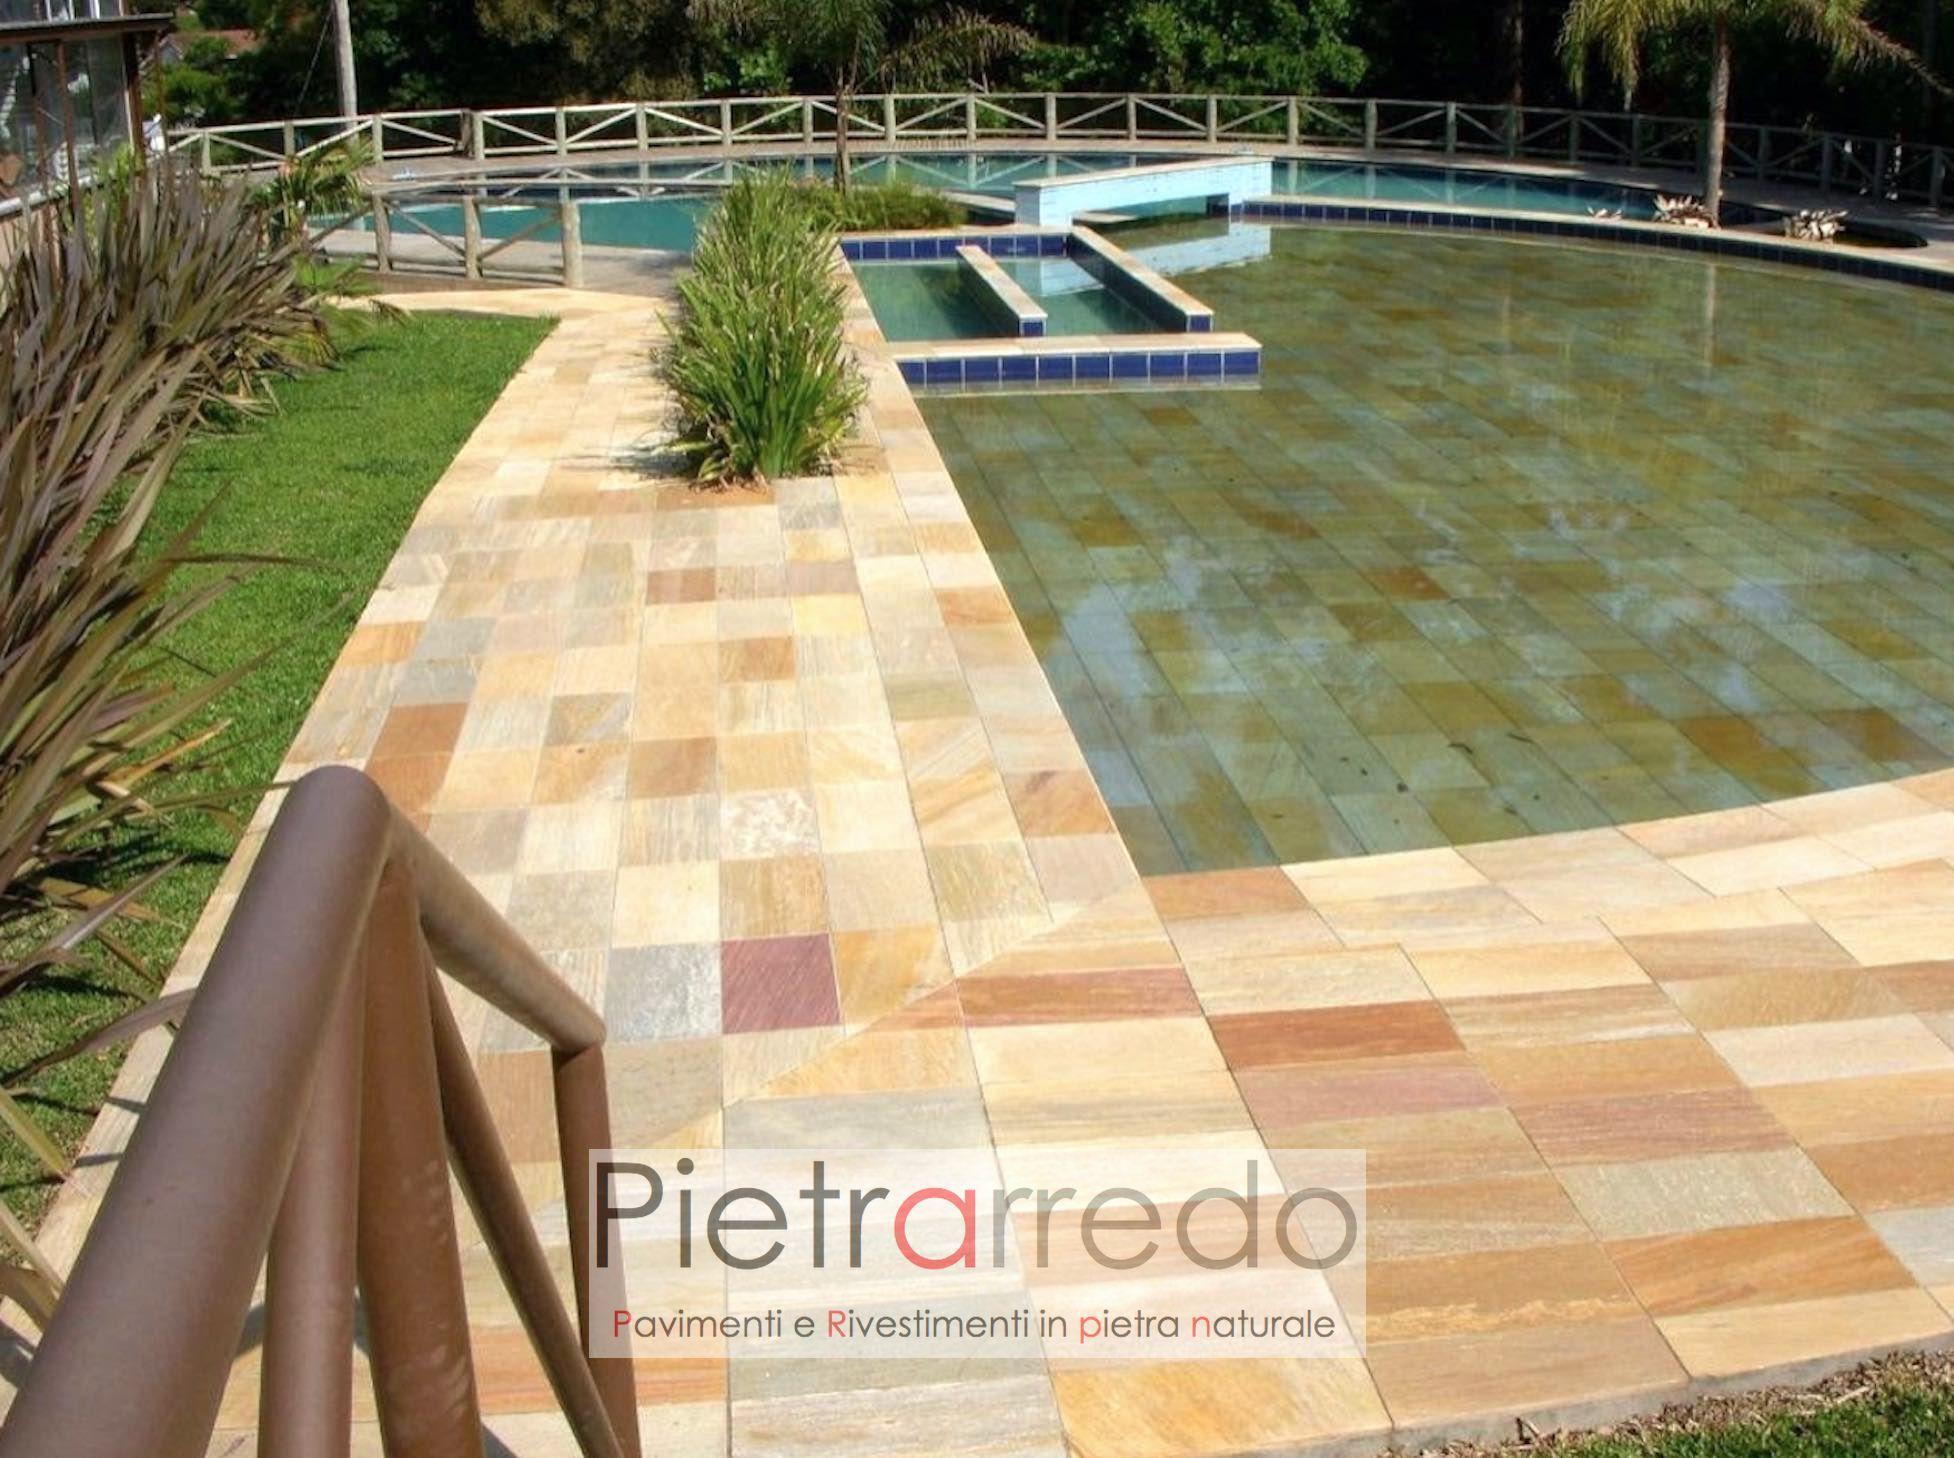 costo perimetro piscina gradino tondo pietra quarzite brasiliana antiscivolo pietrarredo gontero barge